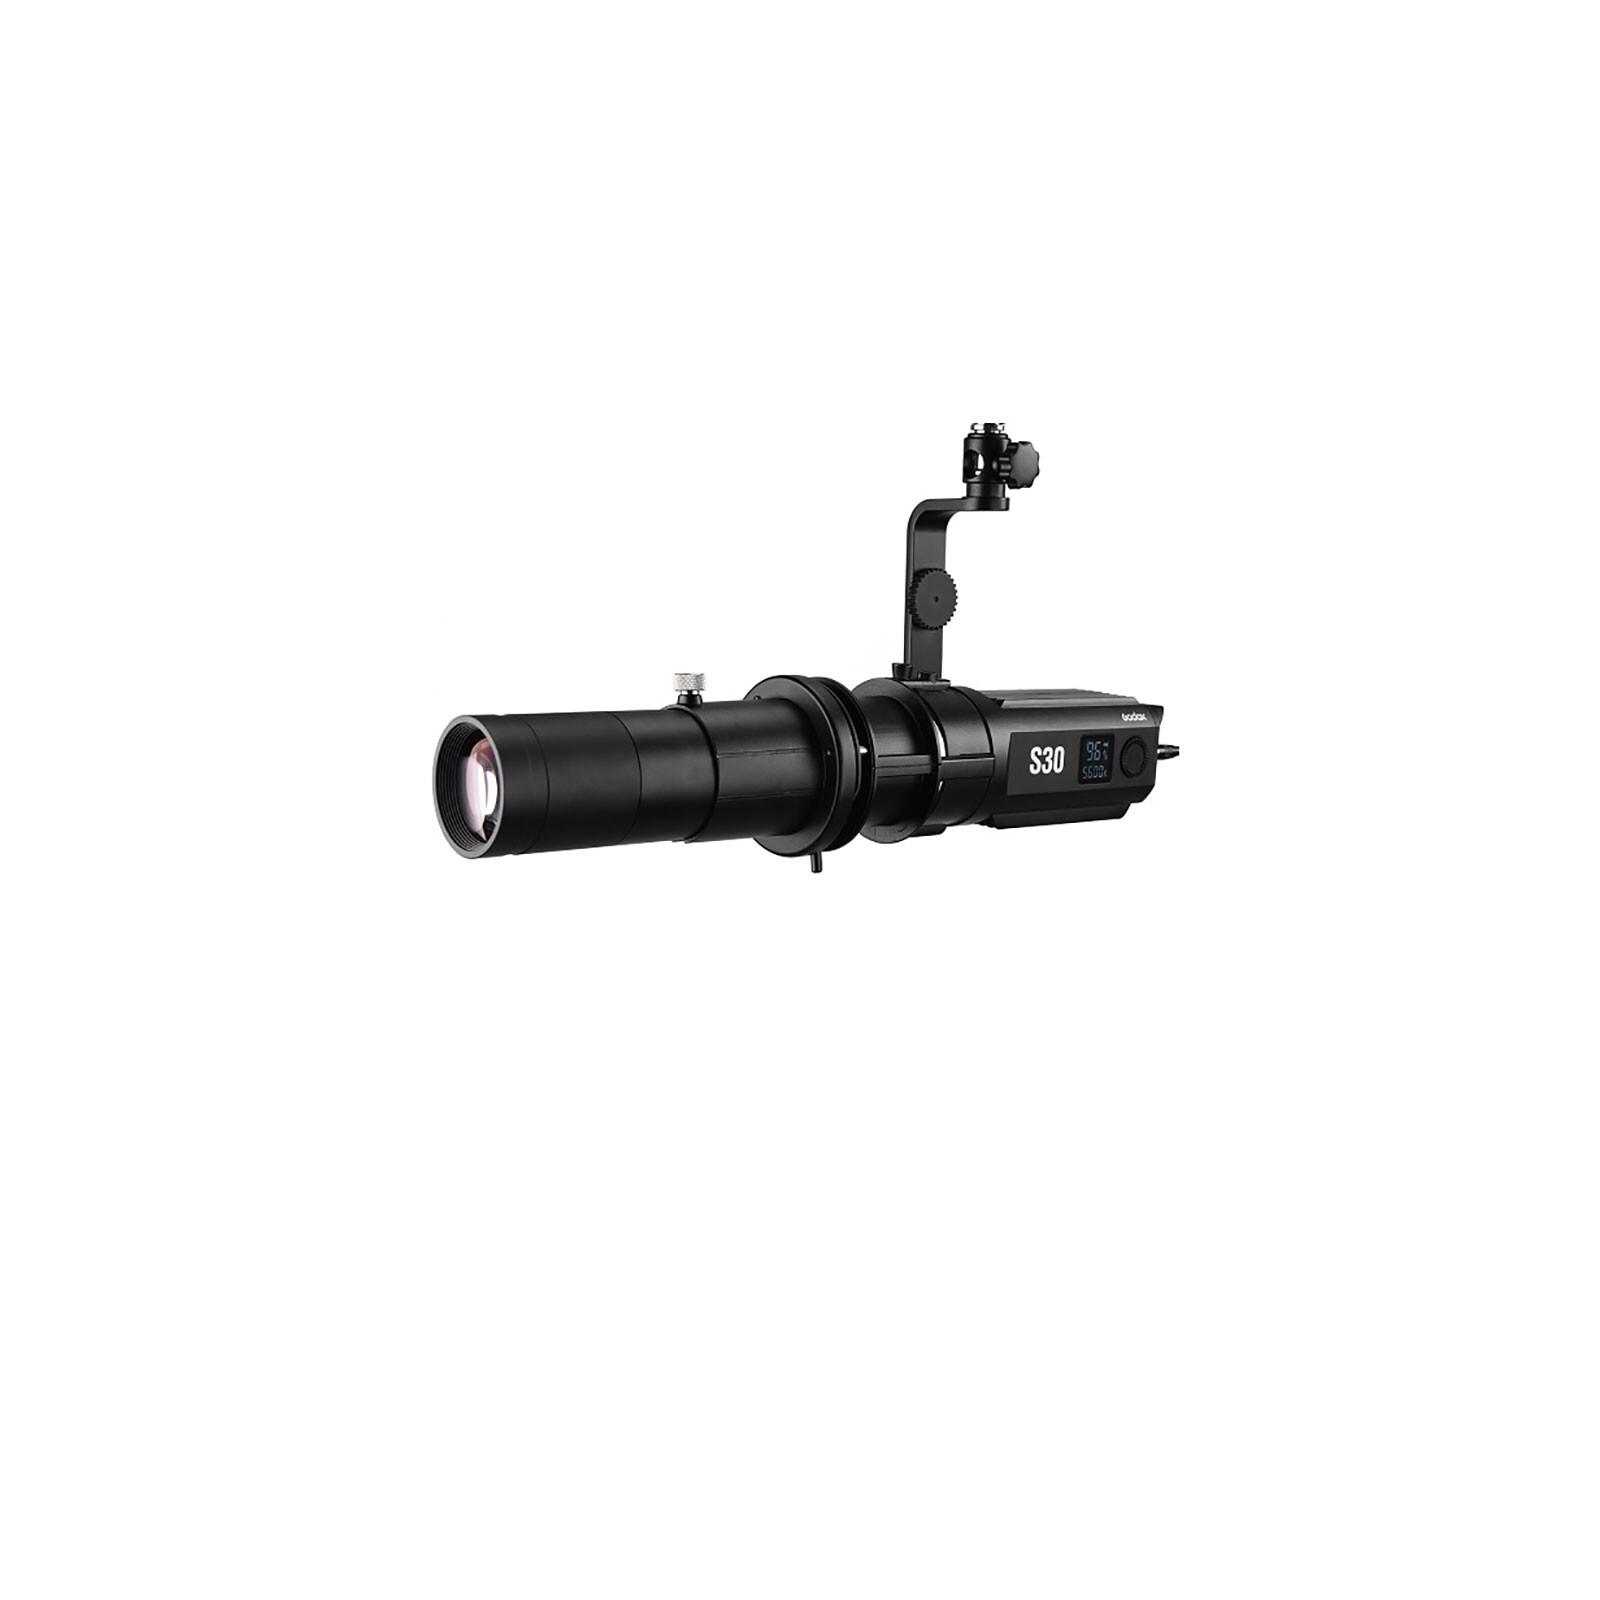 GODOX Lens 150mm für S30